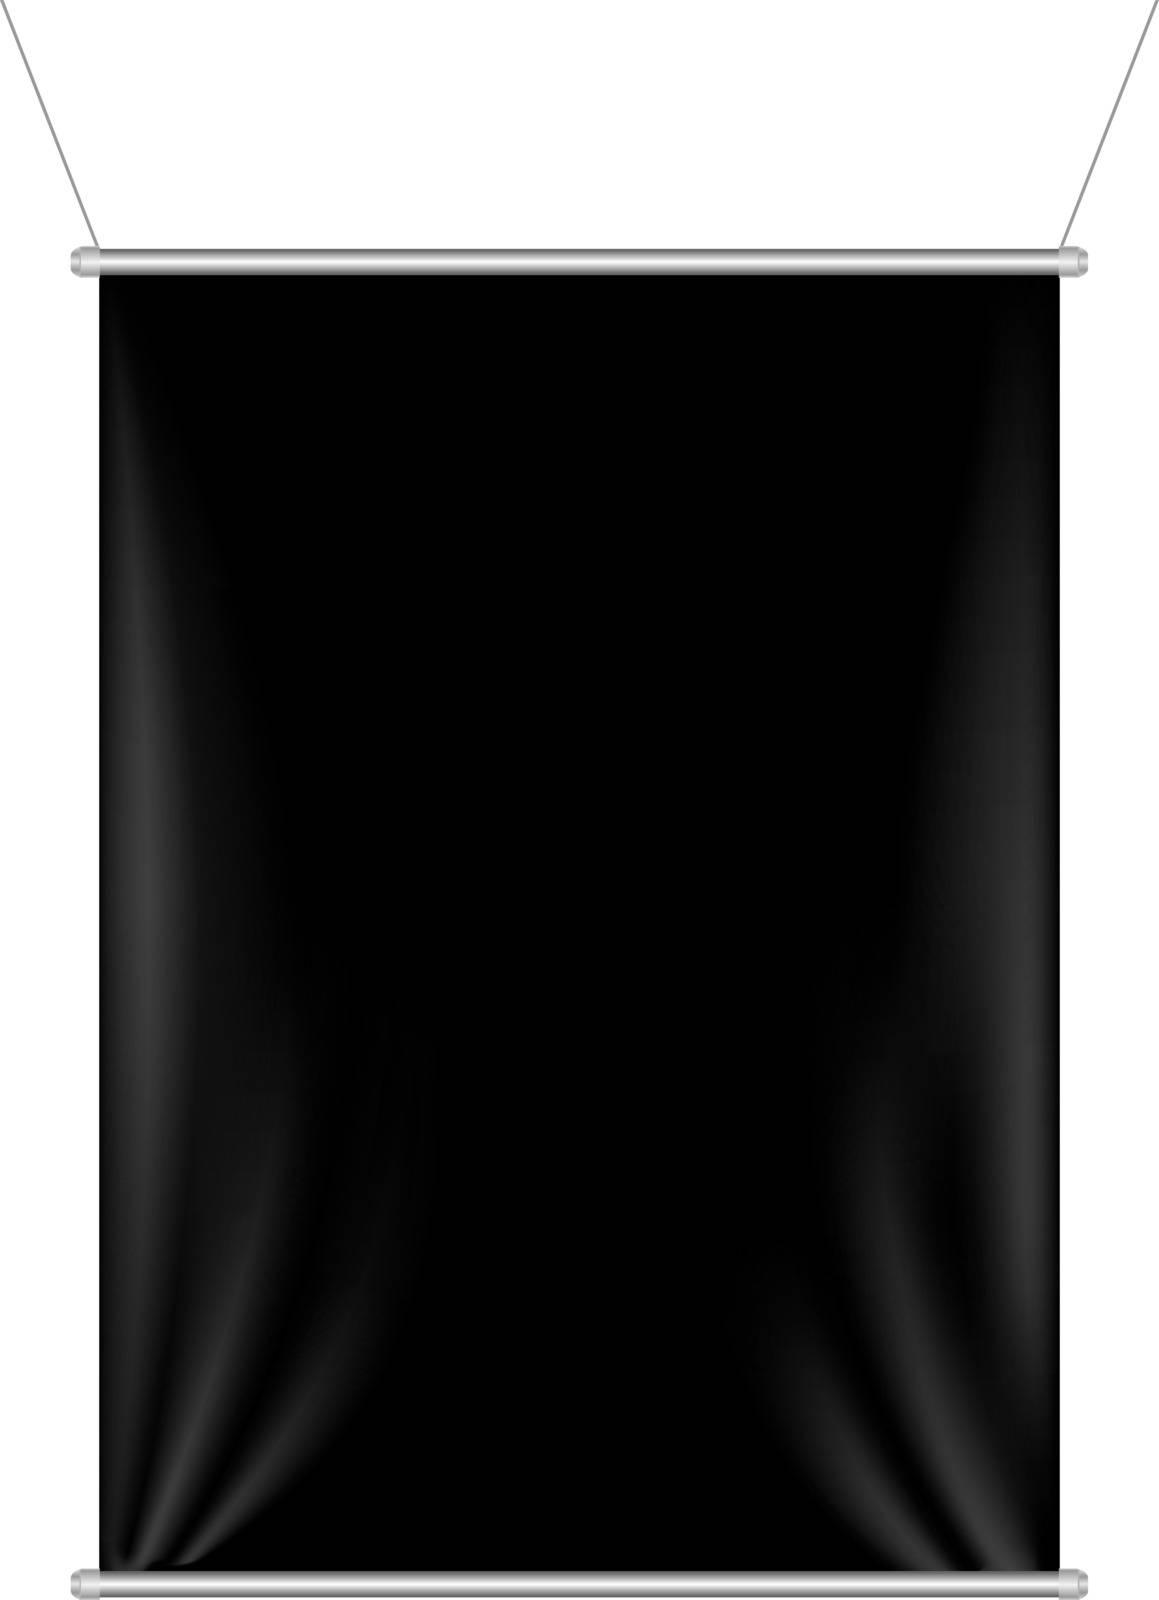 Black Banner With Gradient Mesh, Vector Illustration